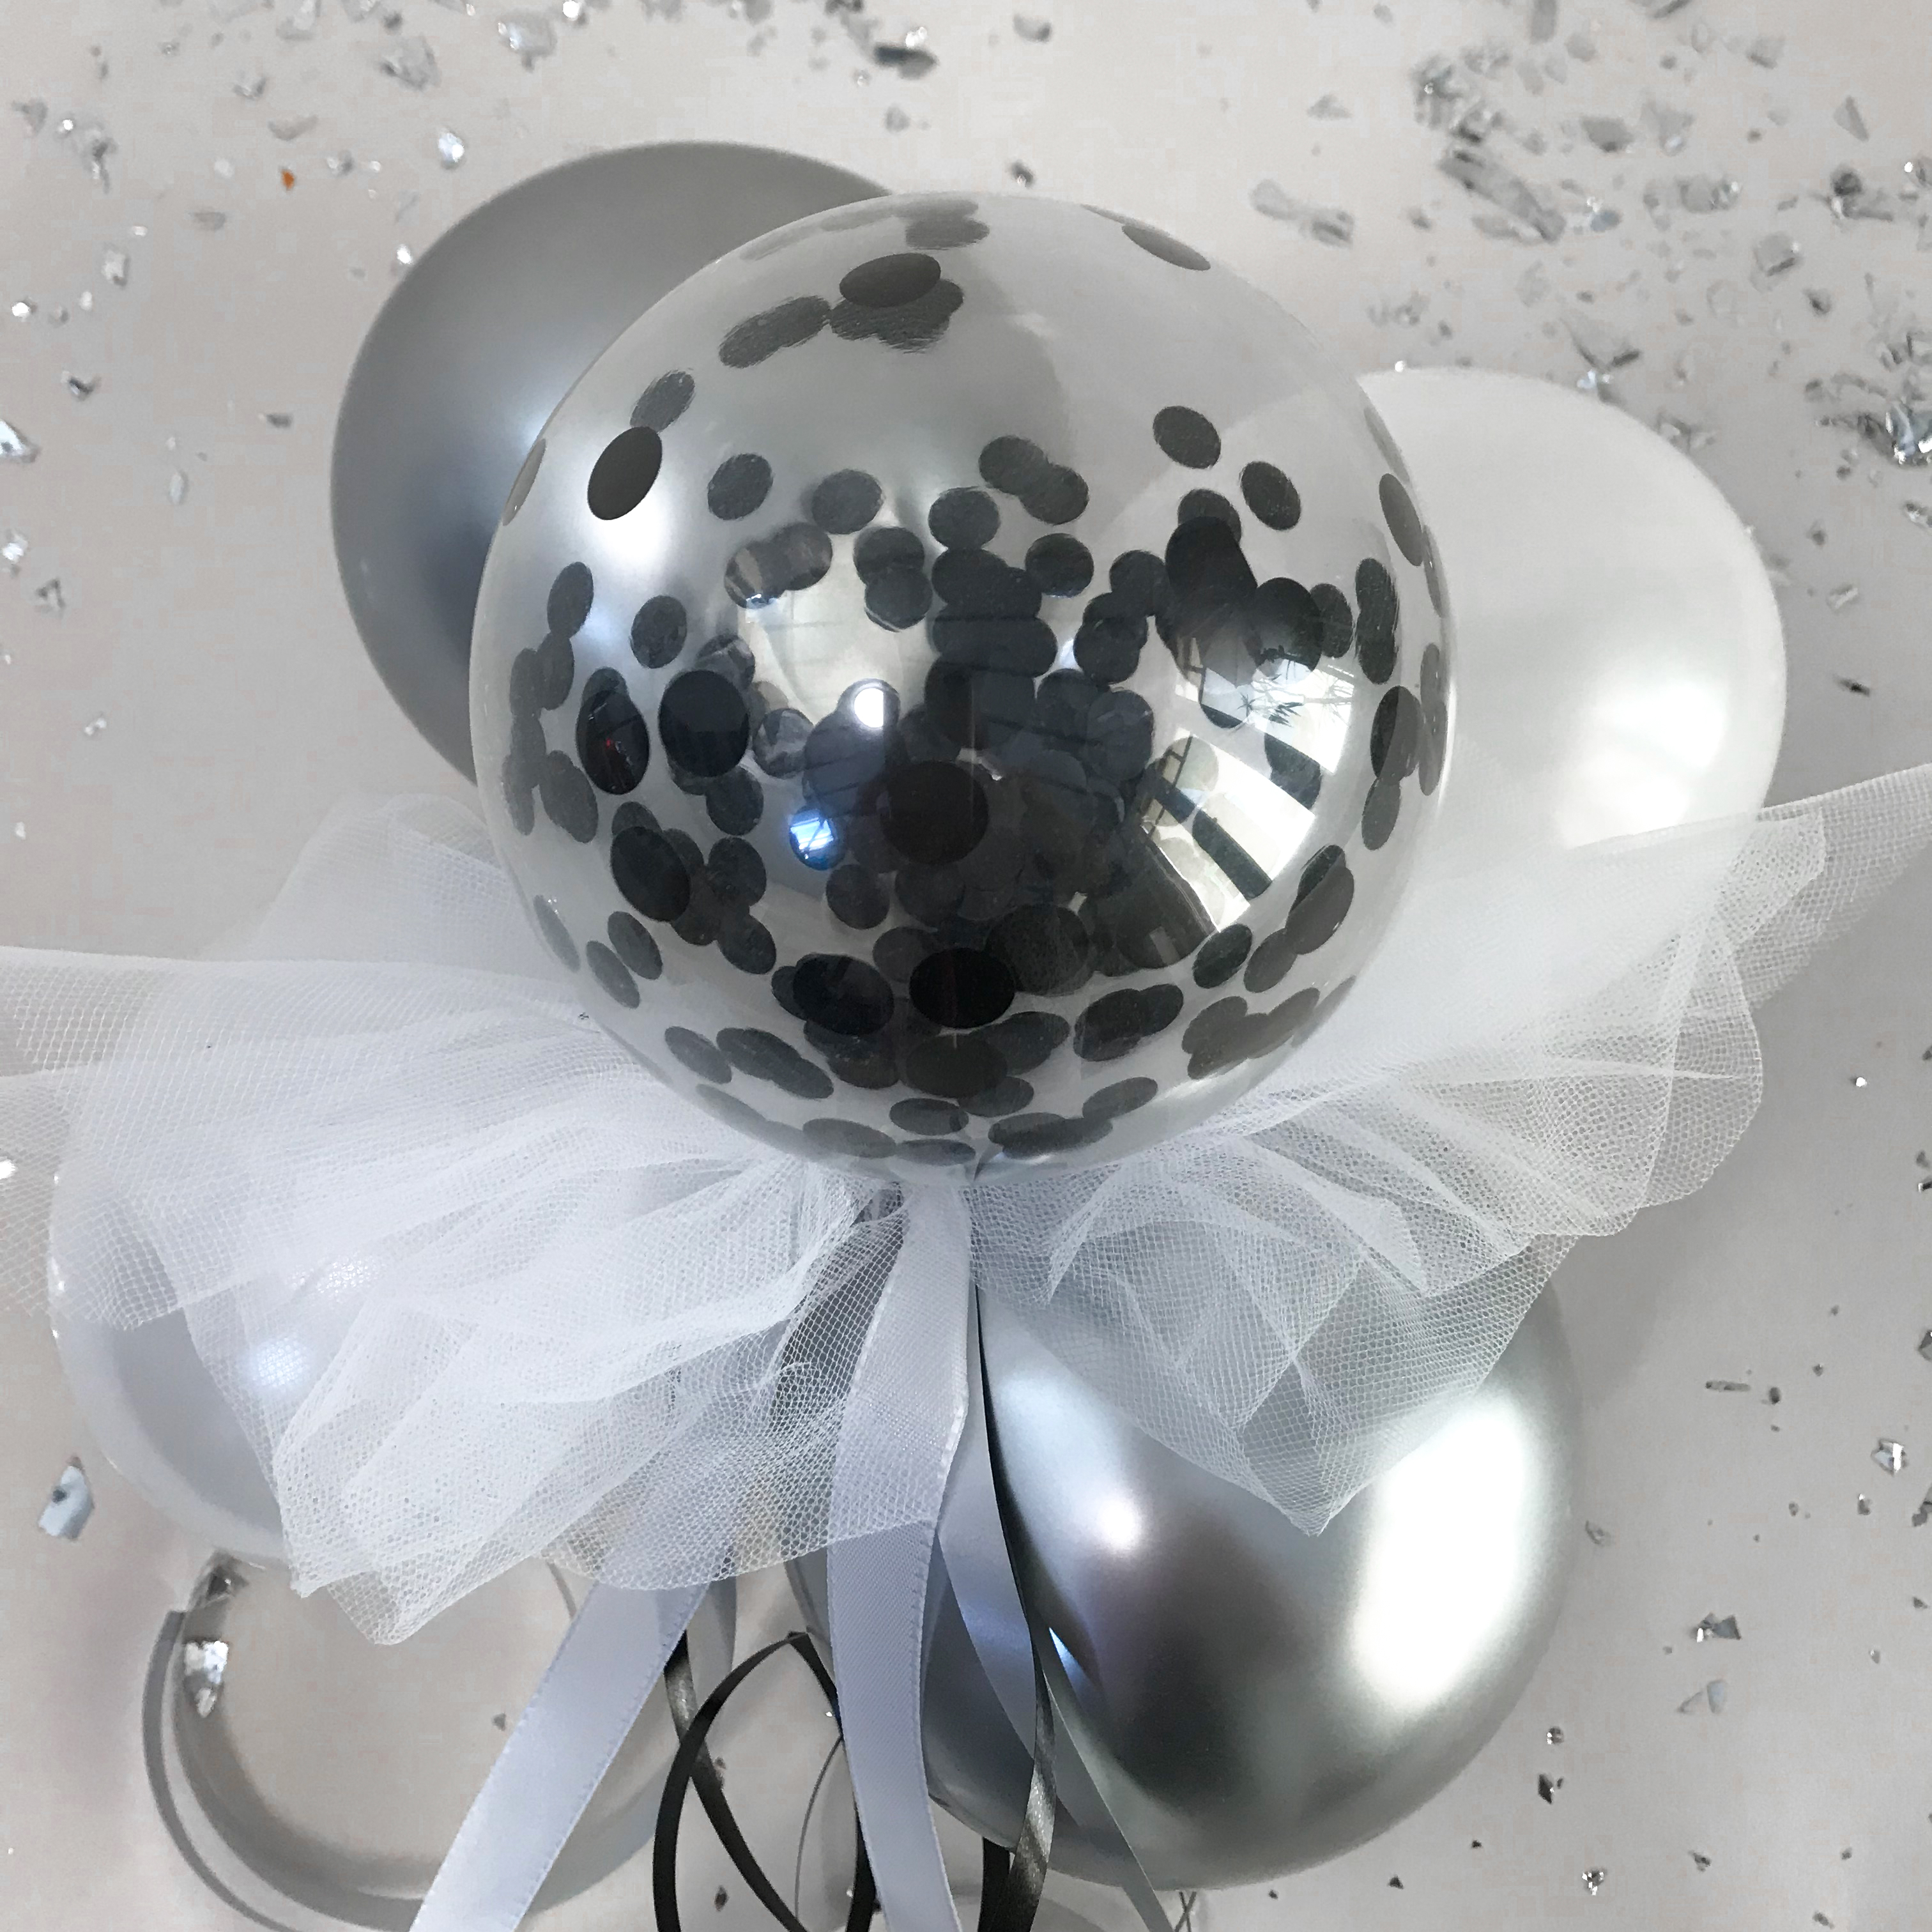 Silber / Weiß / Schwarz Konfetti (Nr. 6)